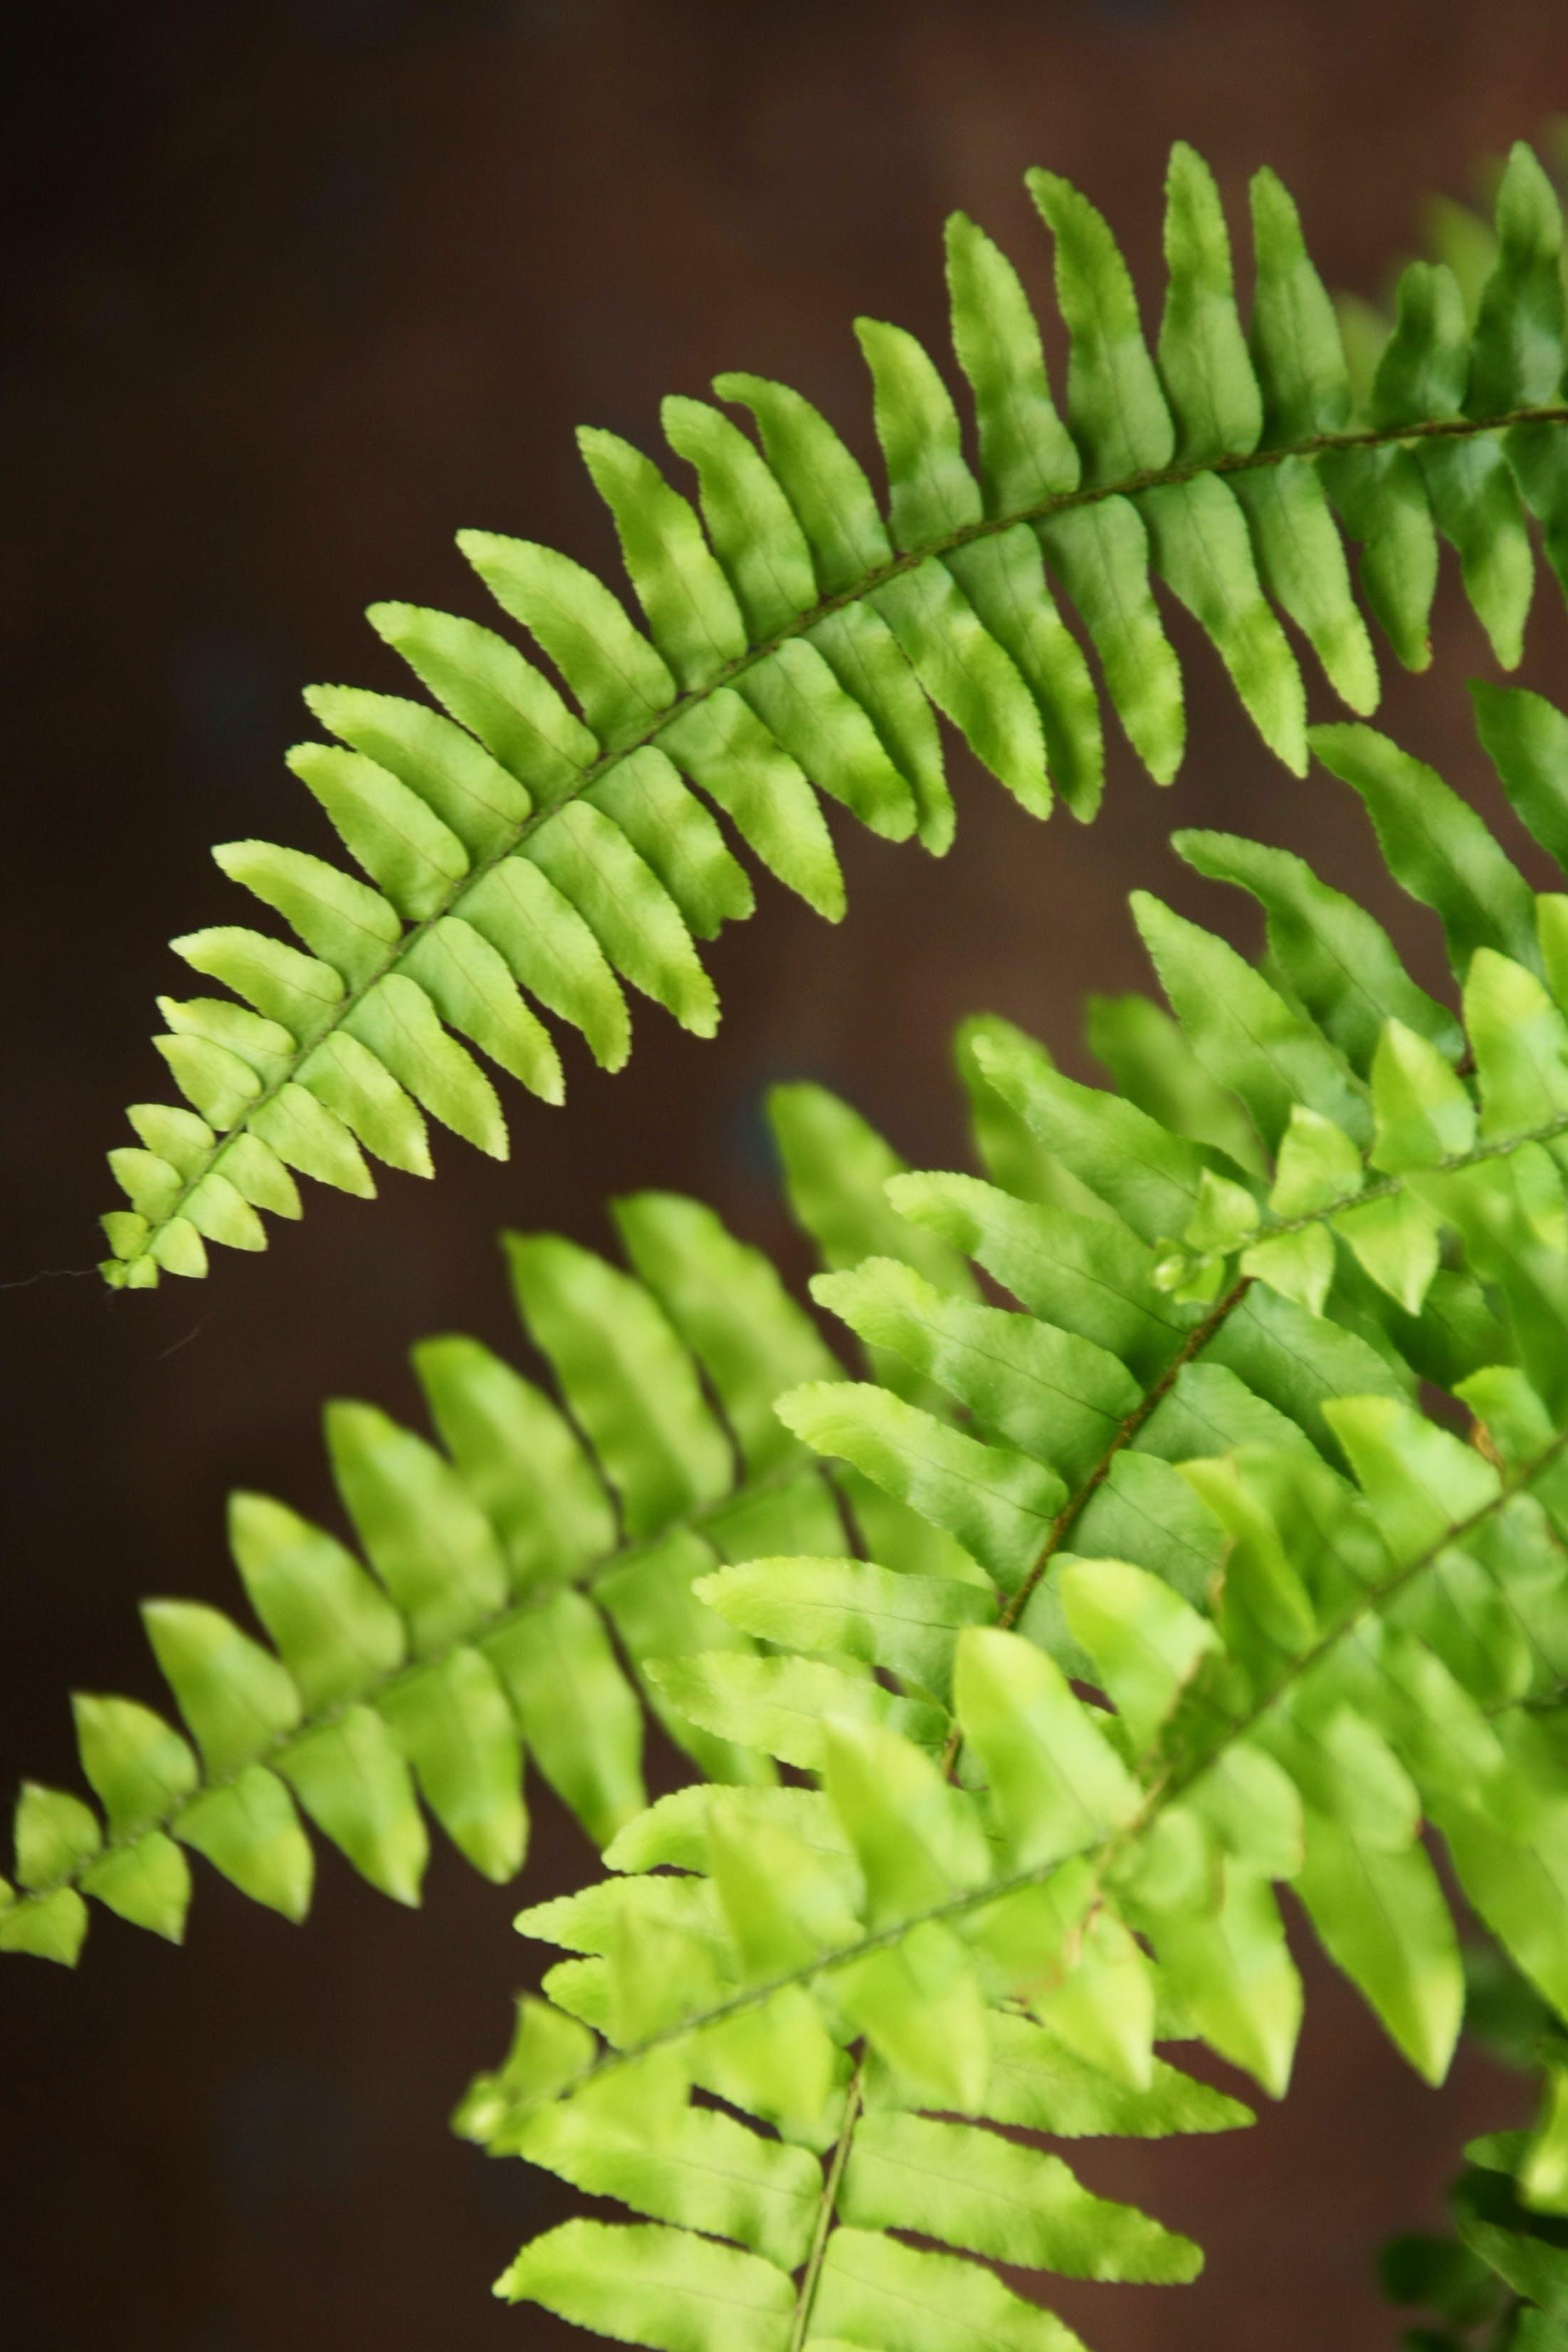 Kostenloses Stock Foto zu farnblättern, grüne blätter, natur, wald